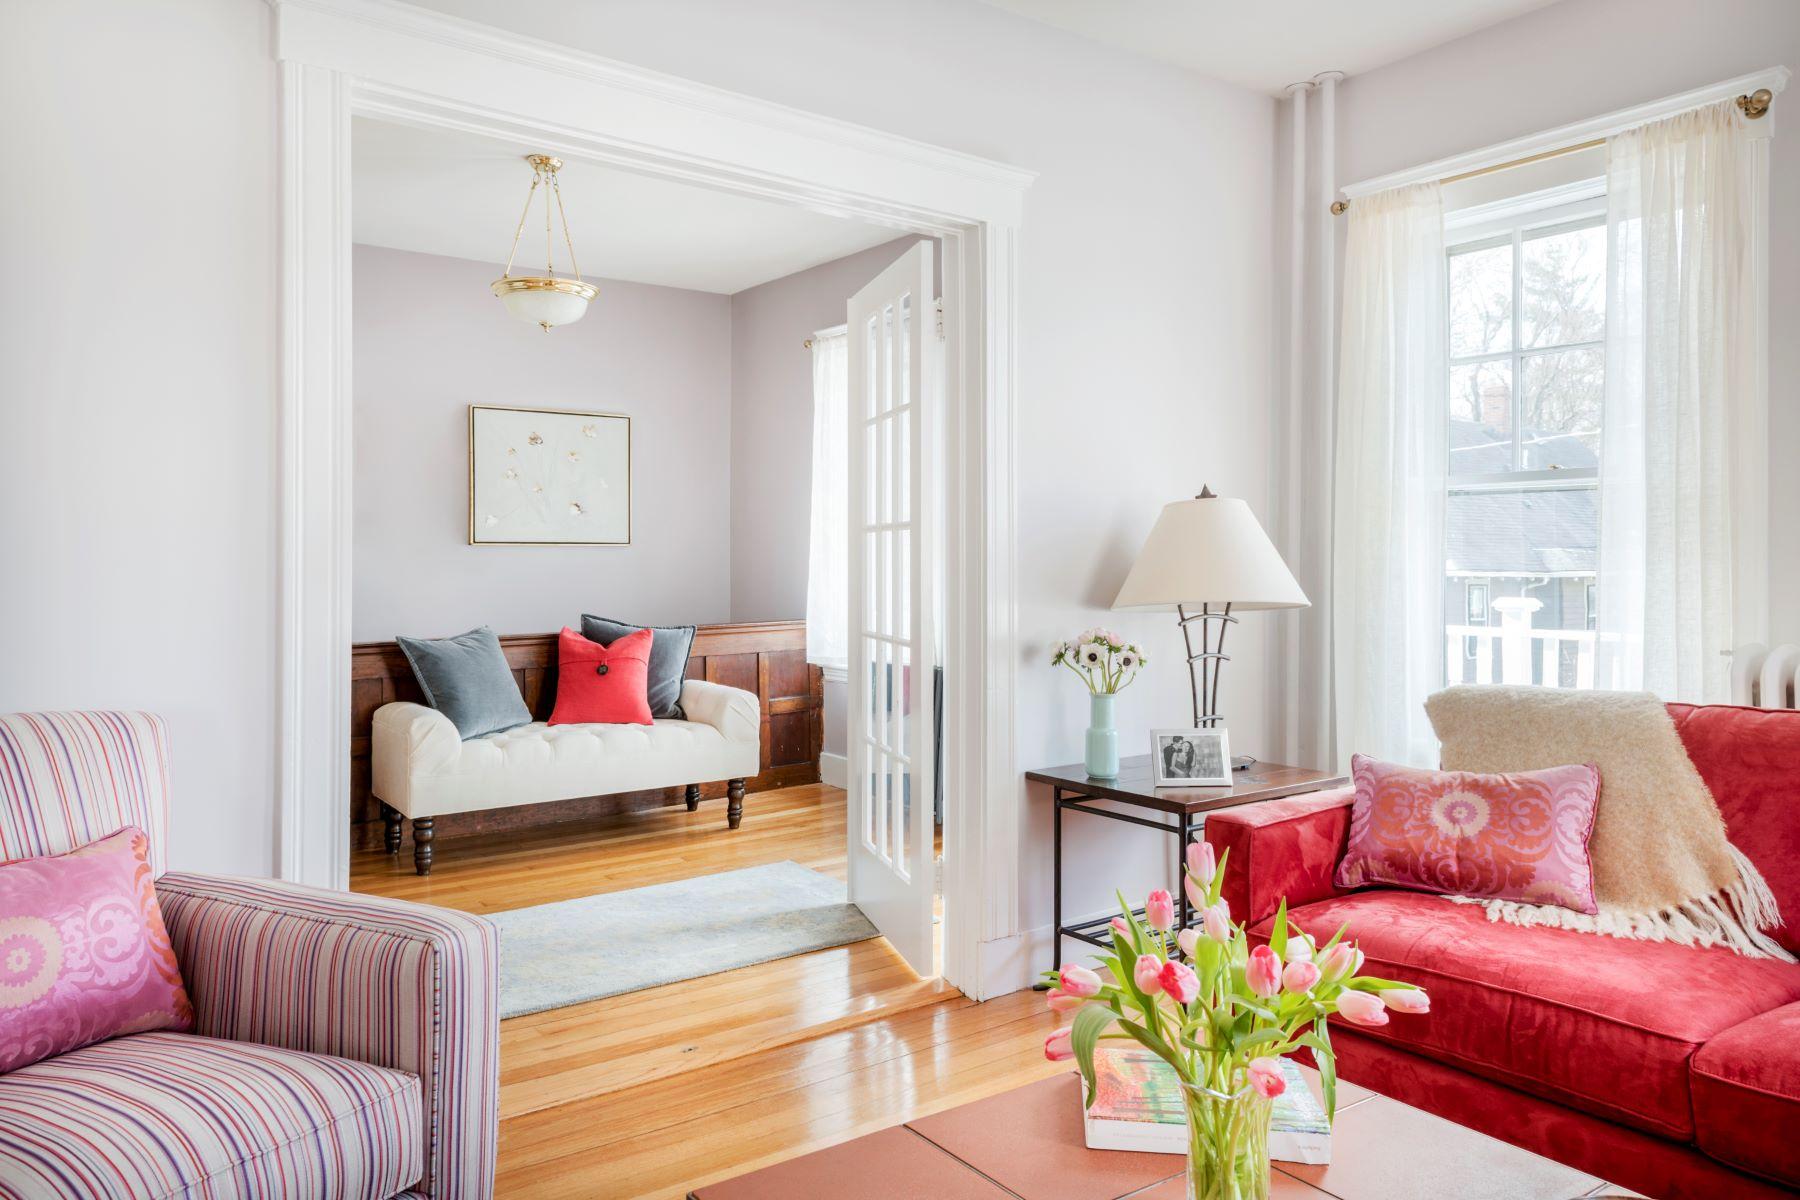 Condominiums για την Πώληση στο 32 Gurney Street, Unit 2 32 Gurney St 2, Cambridge, Μασαχουσετη 02138 Ηνωμένες Πολιτείες